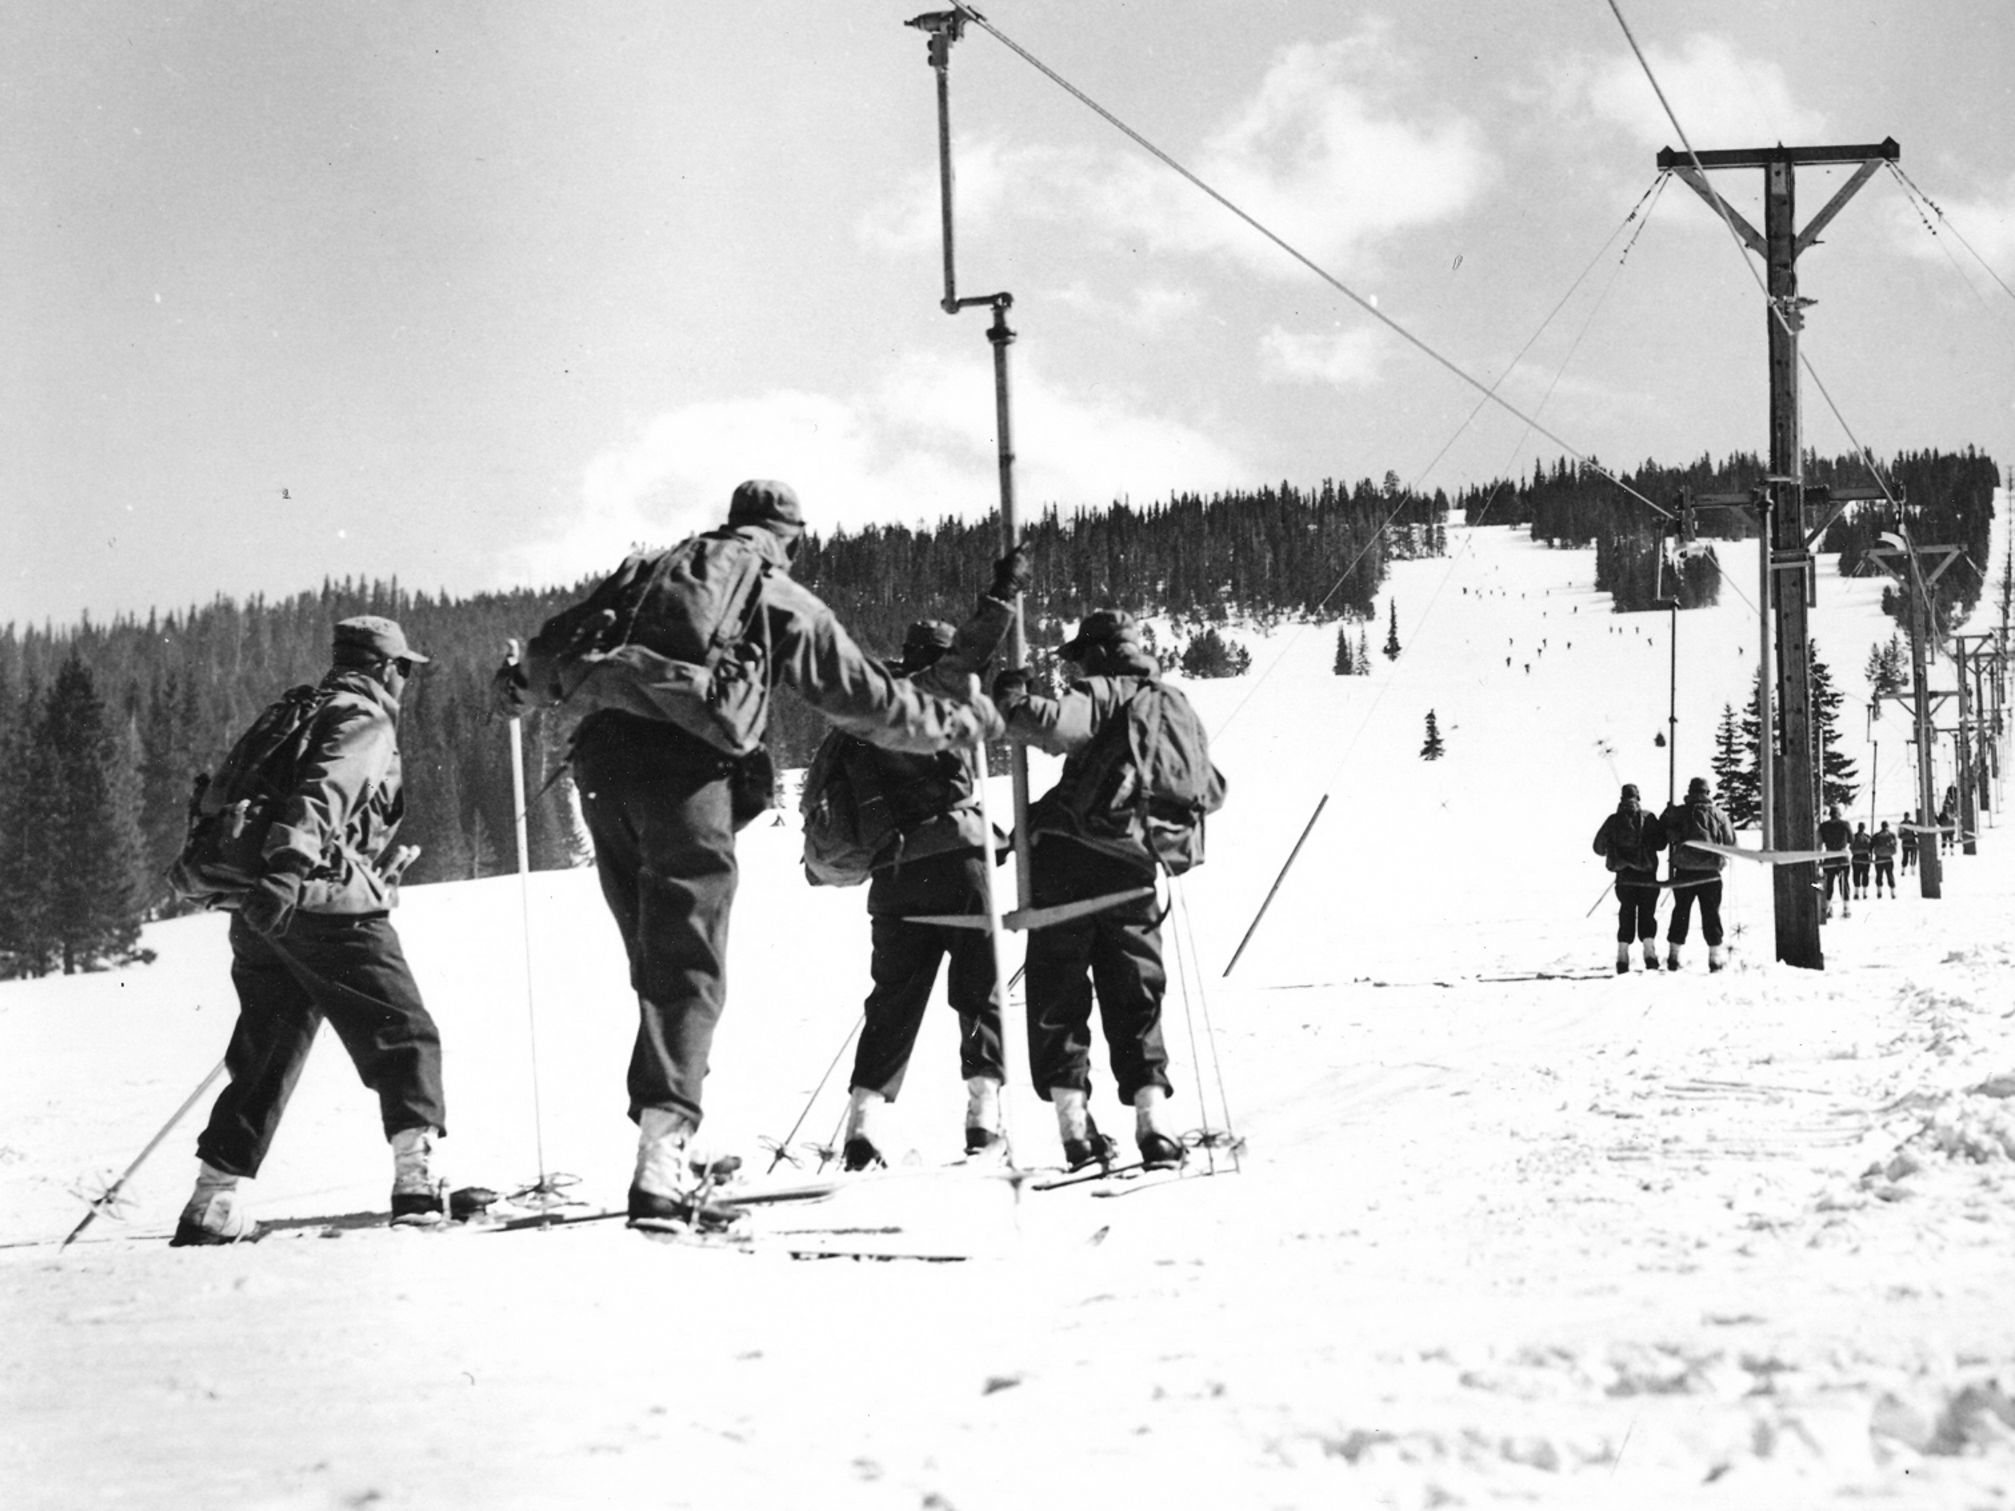 Skimuseumimage1 h3mchn